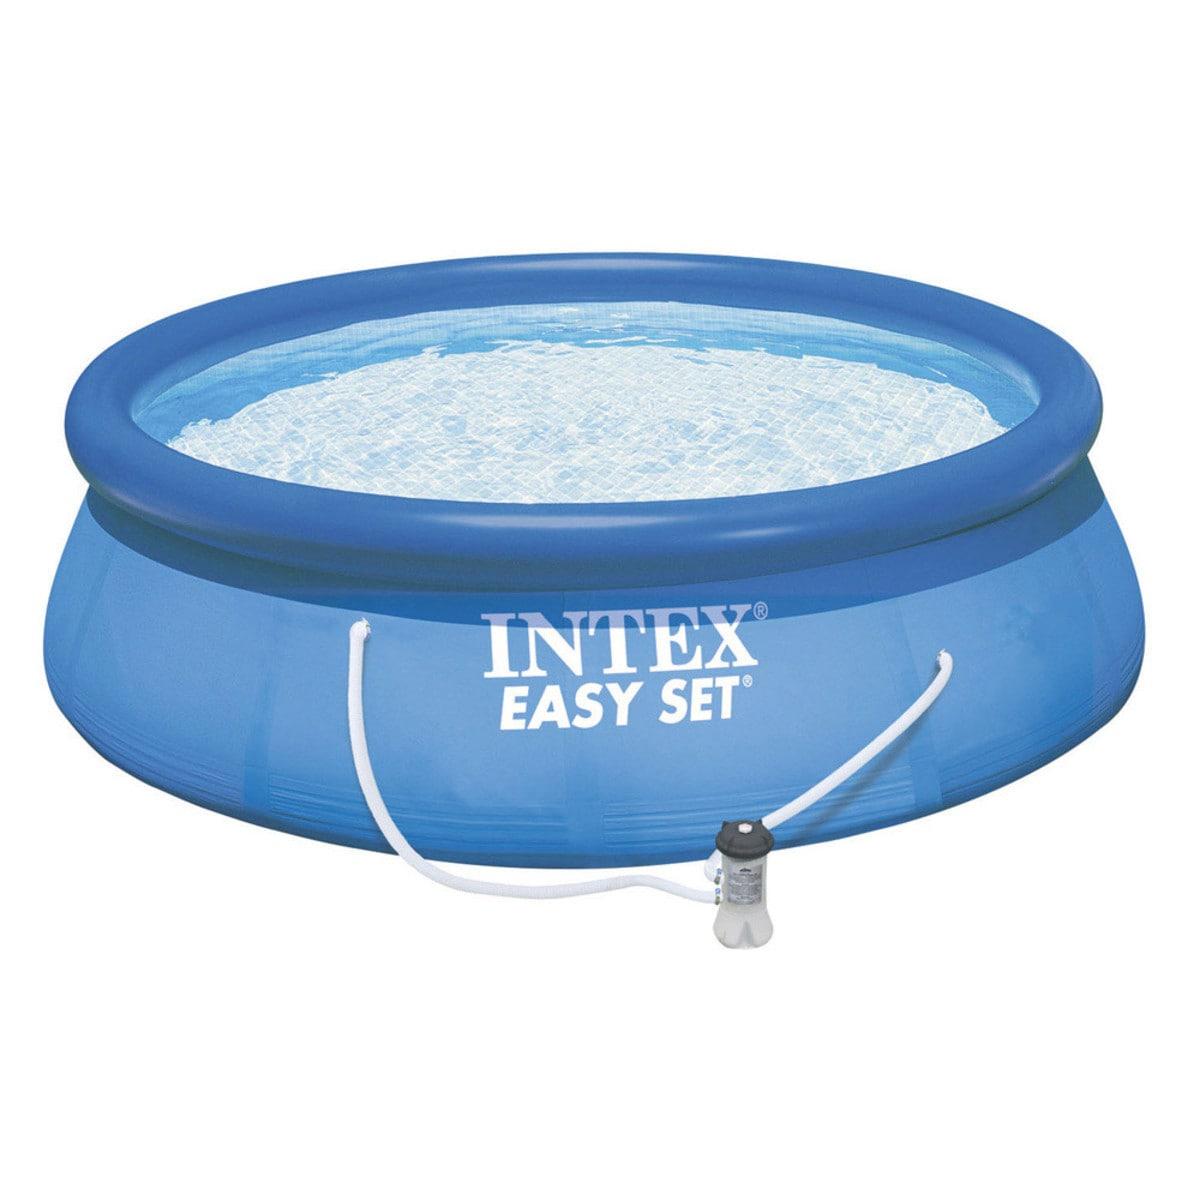 "Intex Recreation 15' x 33"" Easy Set Pool (Blue) Set (As I..."